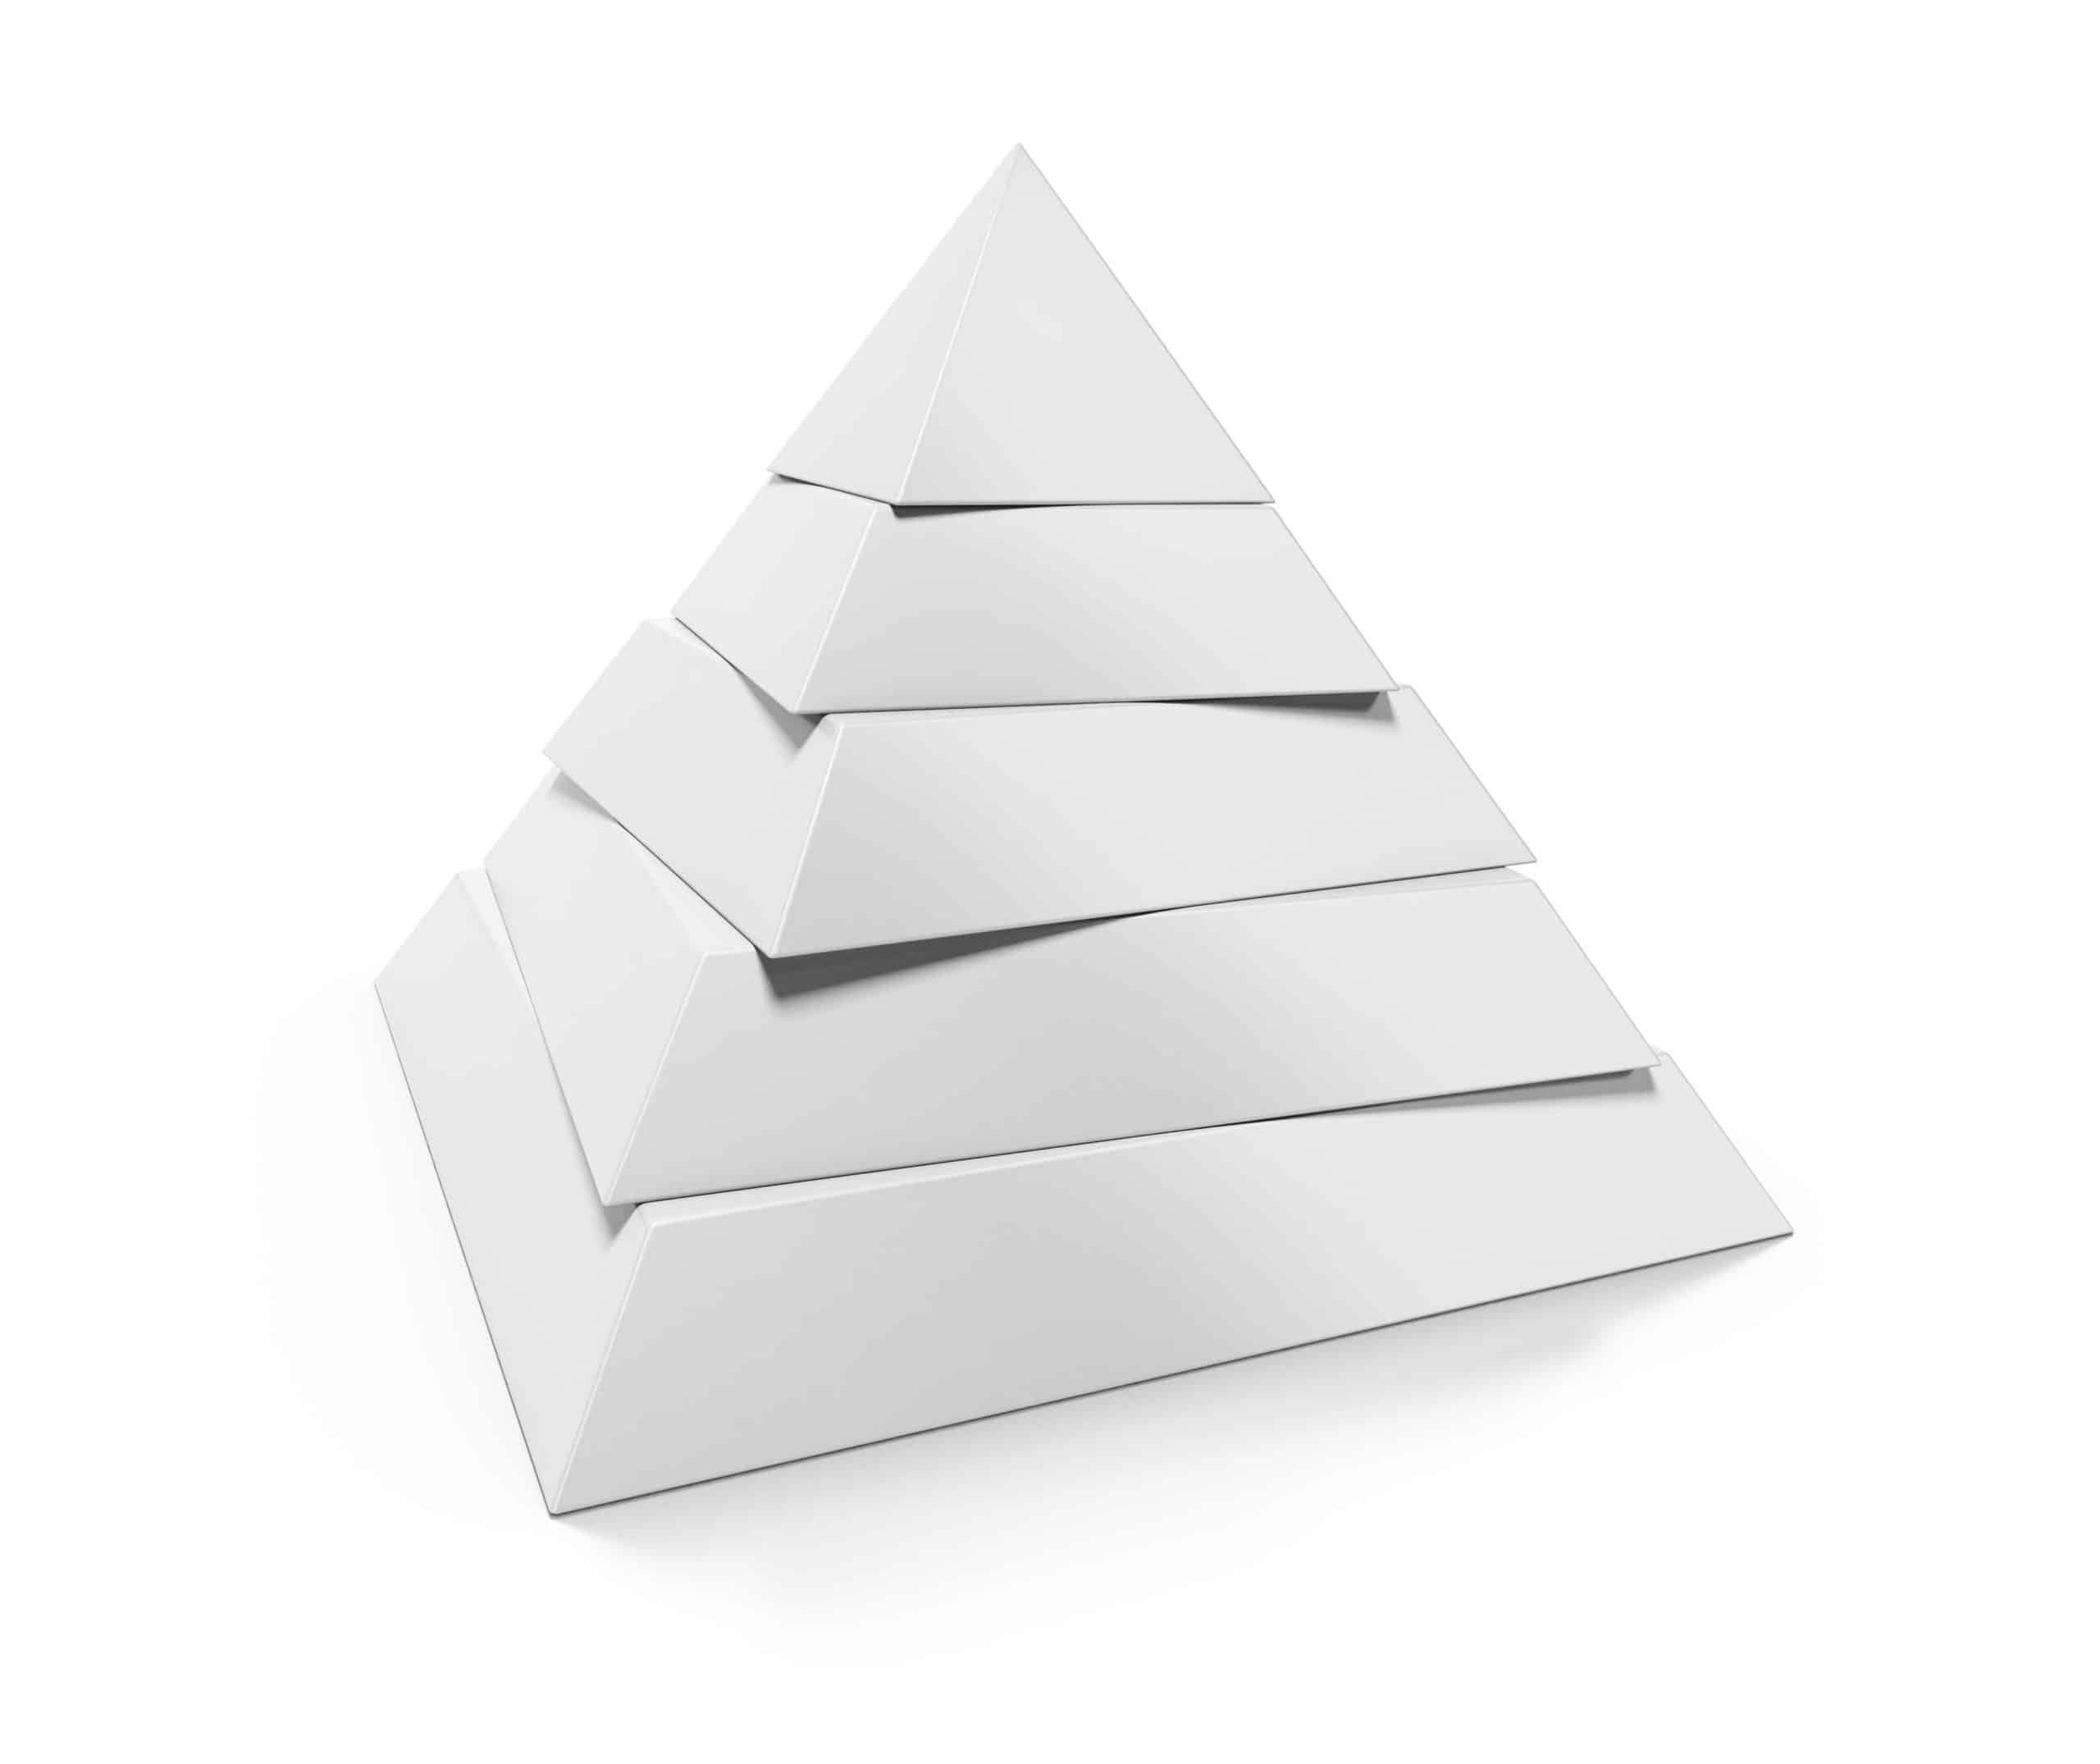 Pyramide nach maslows